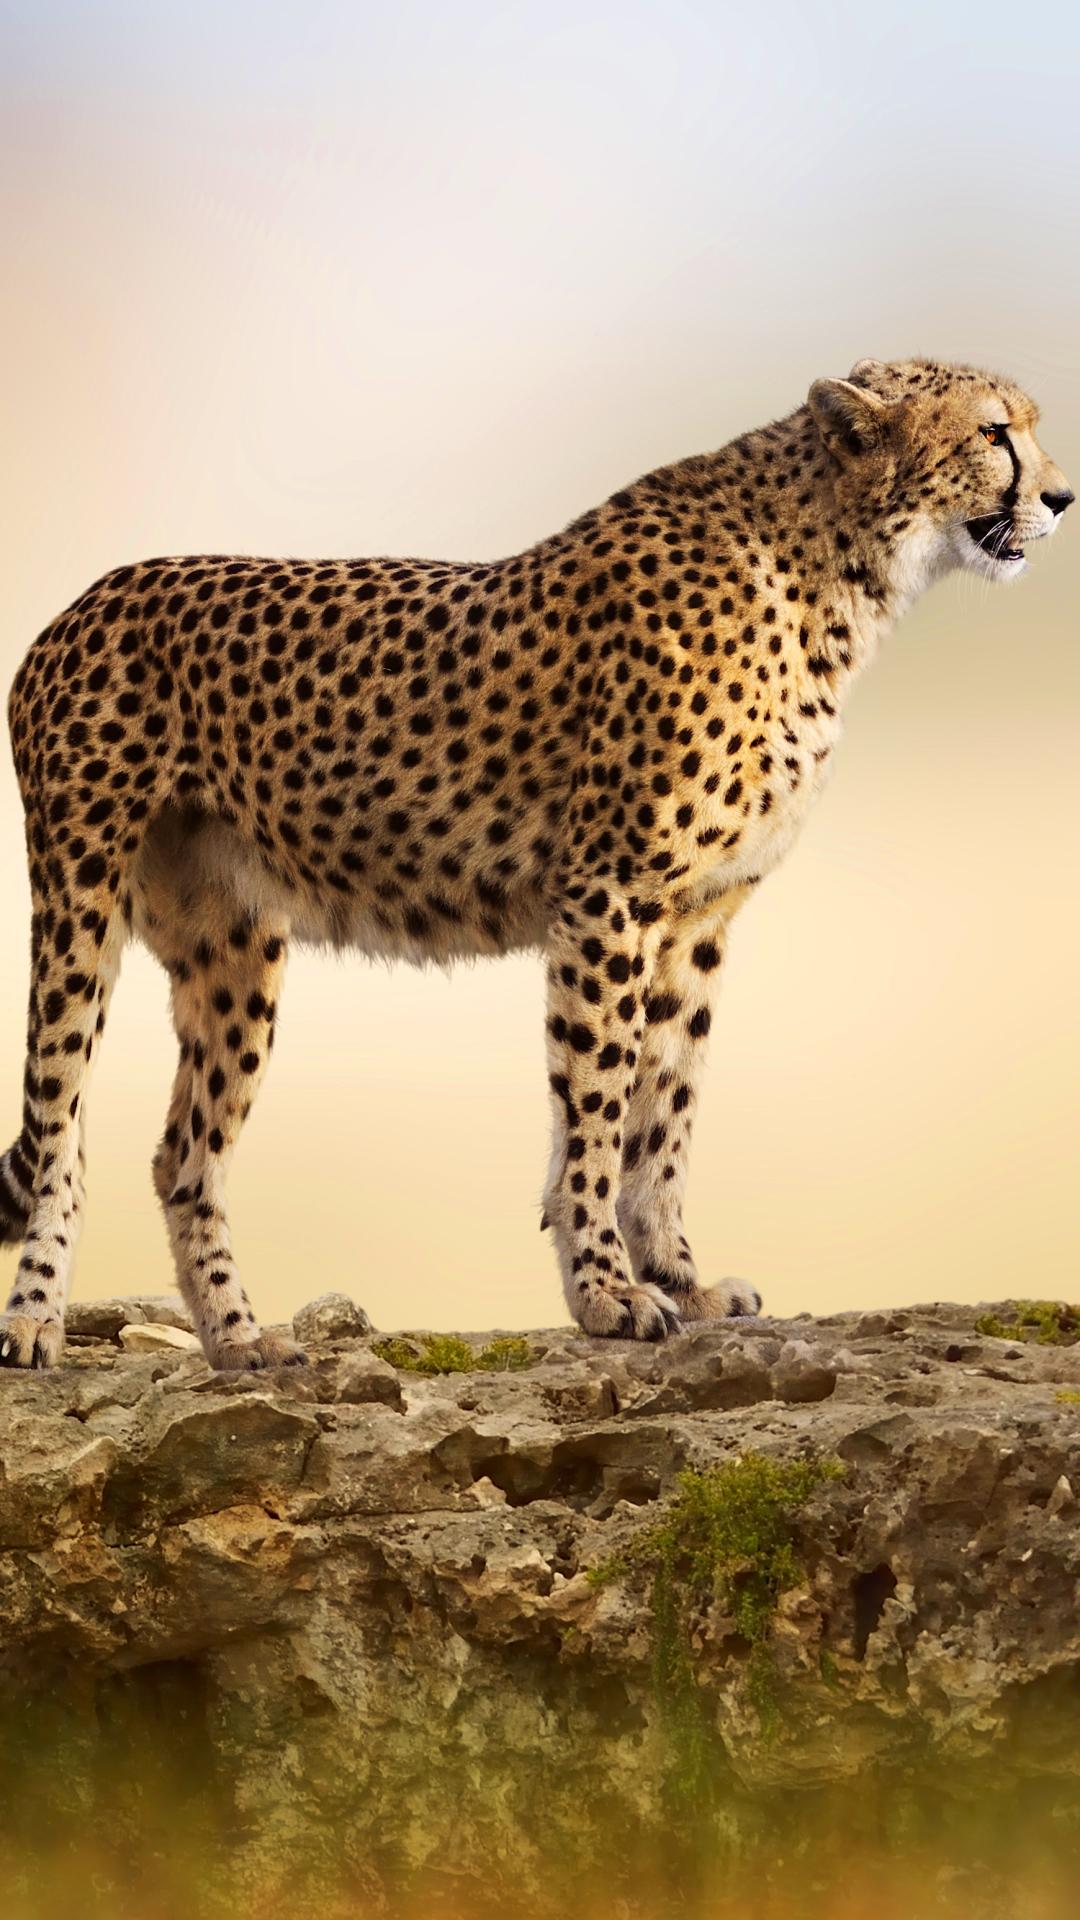 iPhone 8 Plus Animal Cheetah Wallpaper ID